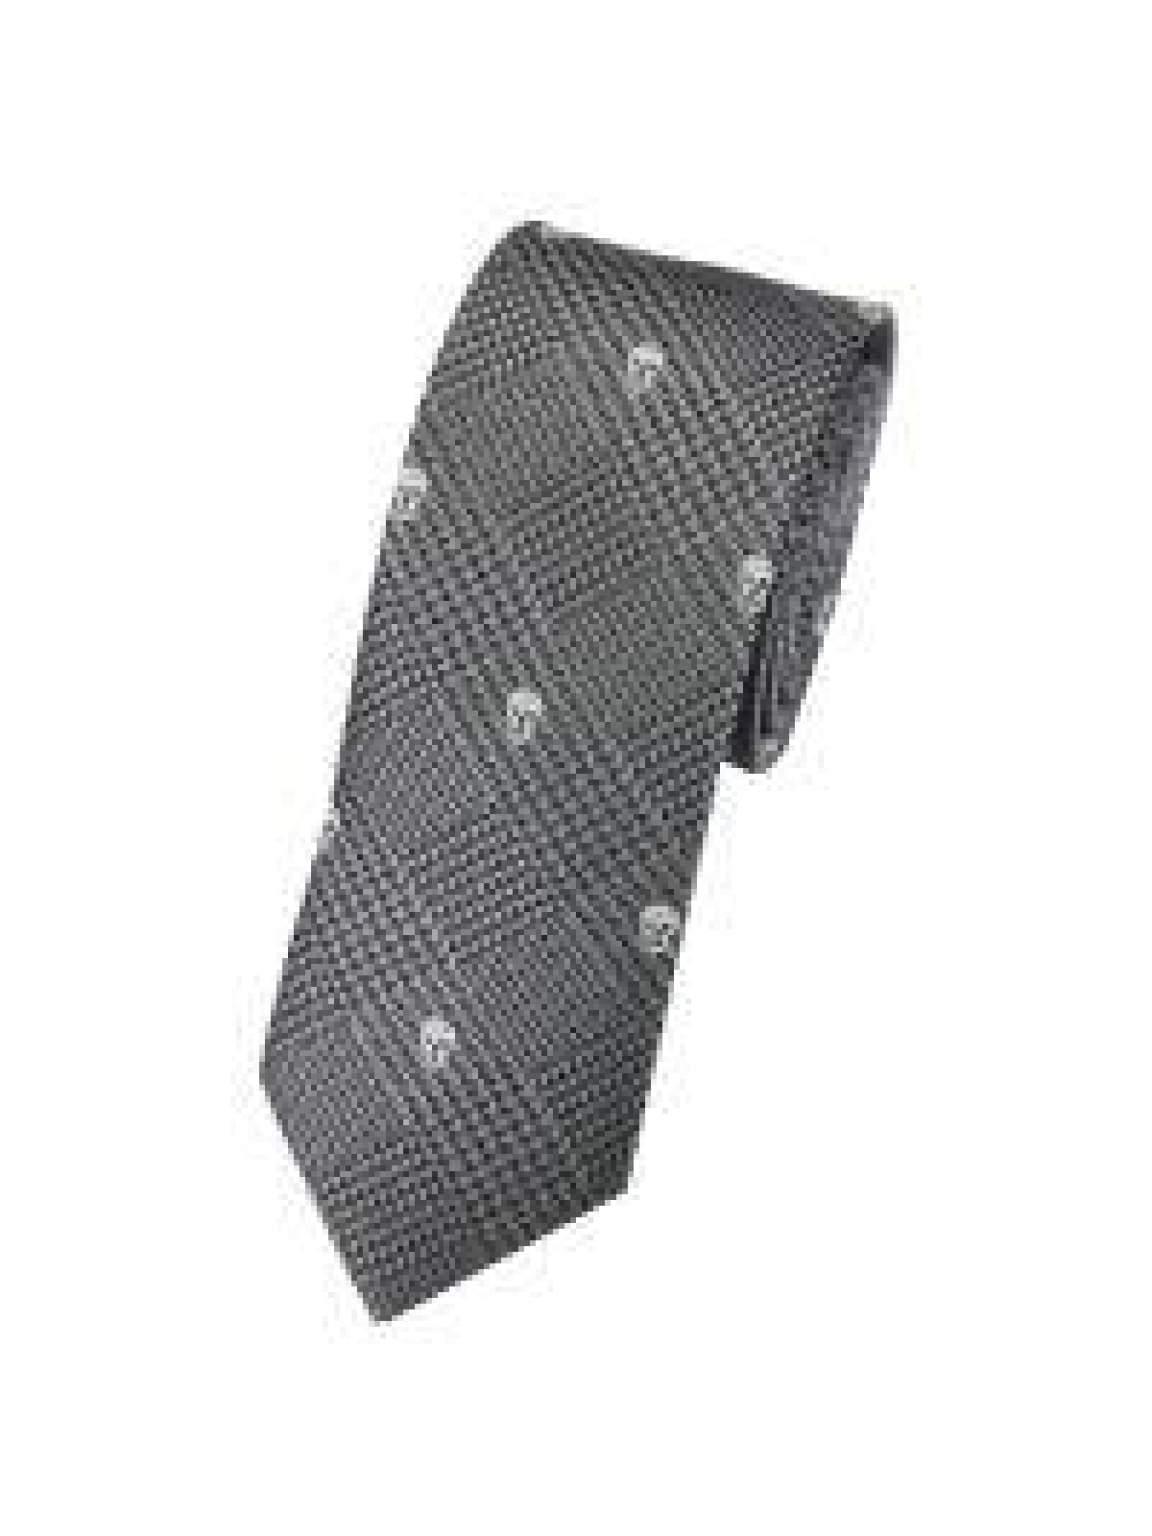 LA Smith Grey Skinny Skull Tie - Accessories